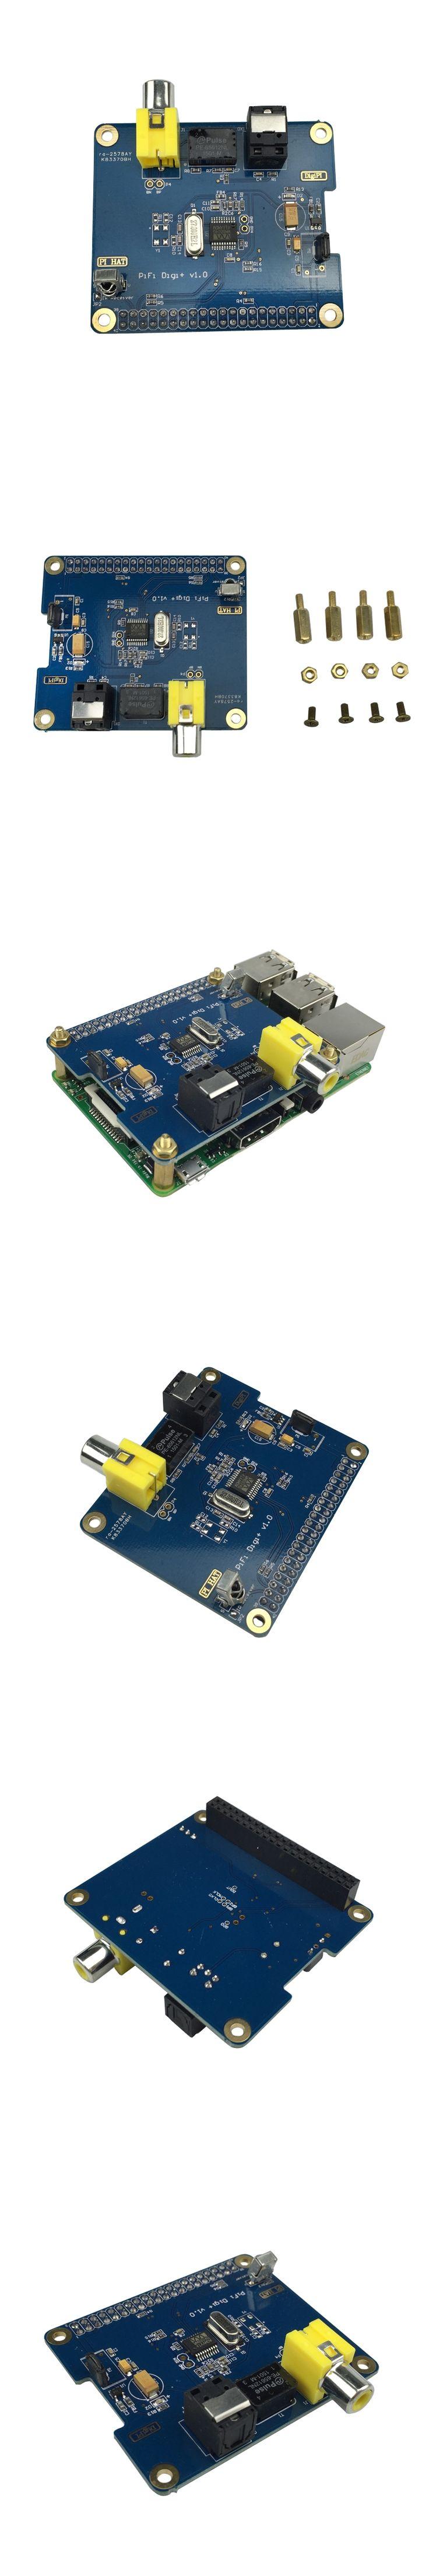 New Raspberry Pi 3 Digital Audio Board Sound Card Expansion Board I2S Interface support Raspberry Pi 2 Model B